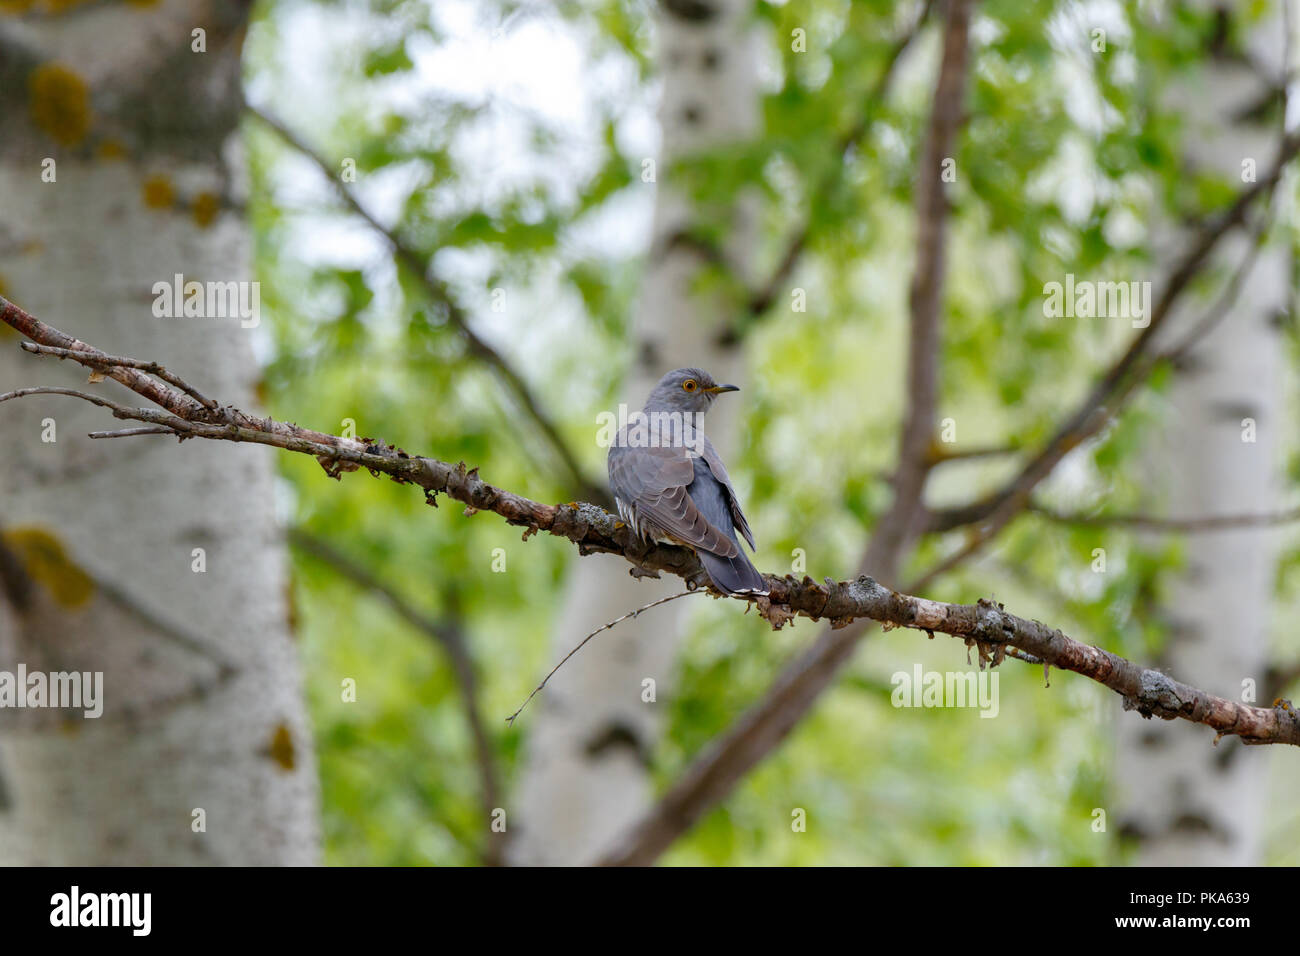 Common Cuckoo (Cuculus canorus). Russia, the Ryazan region (Ryazanskaya oblast), the Pronsky District, Denisovo. - Stock Image